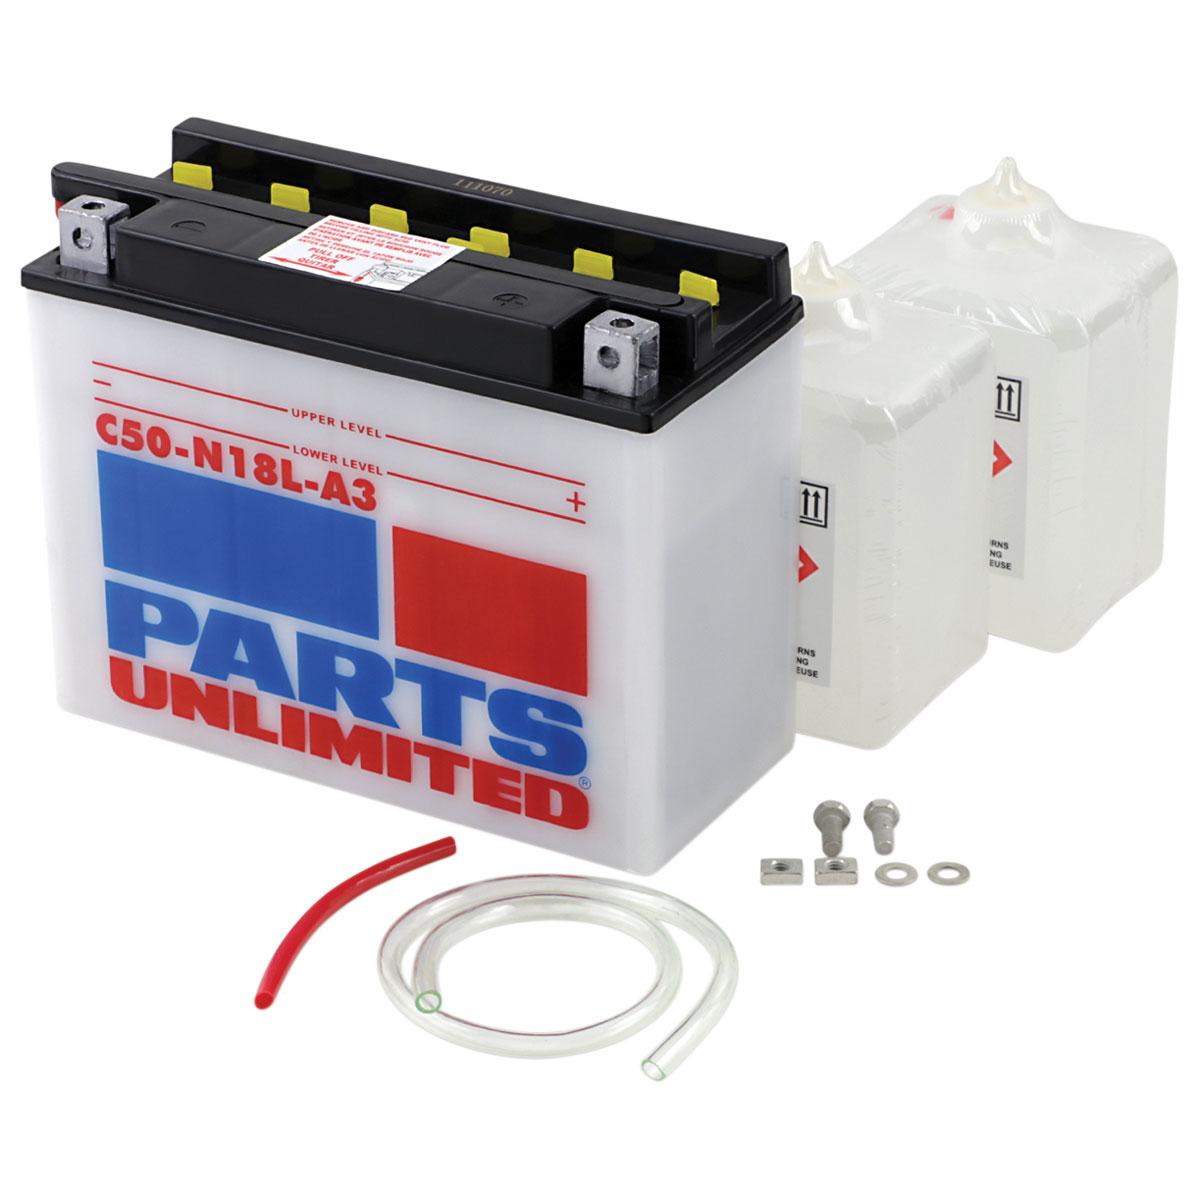 Parts Unlimited Heavy Duty Battery Kit